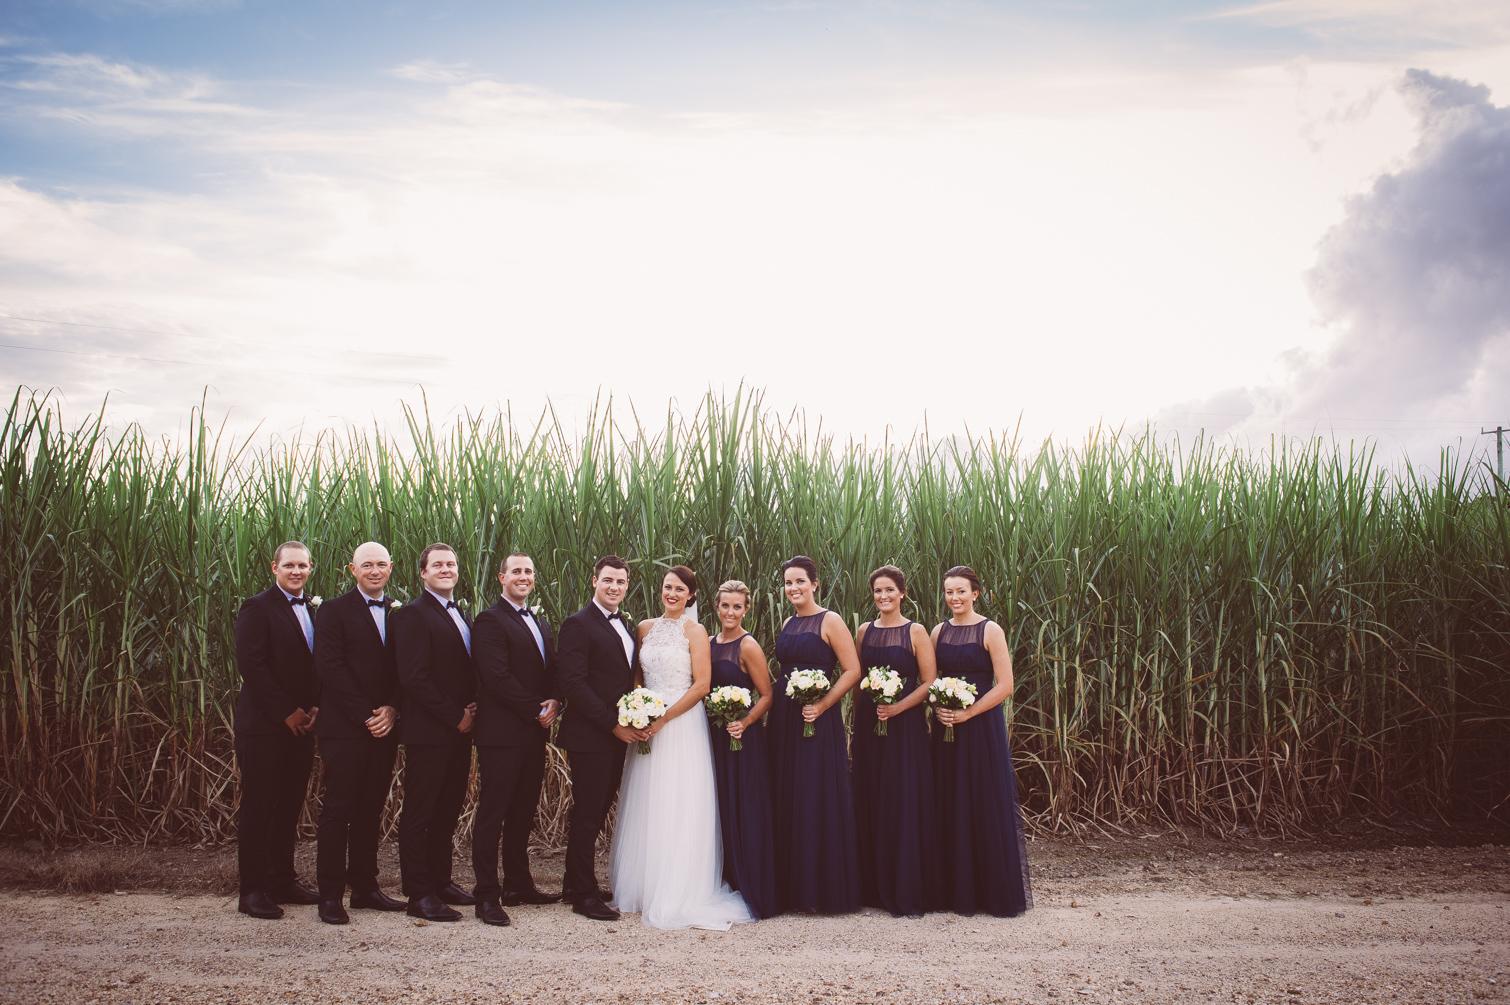 Osteria wedding_New Black Studios 48.jpg